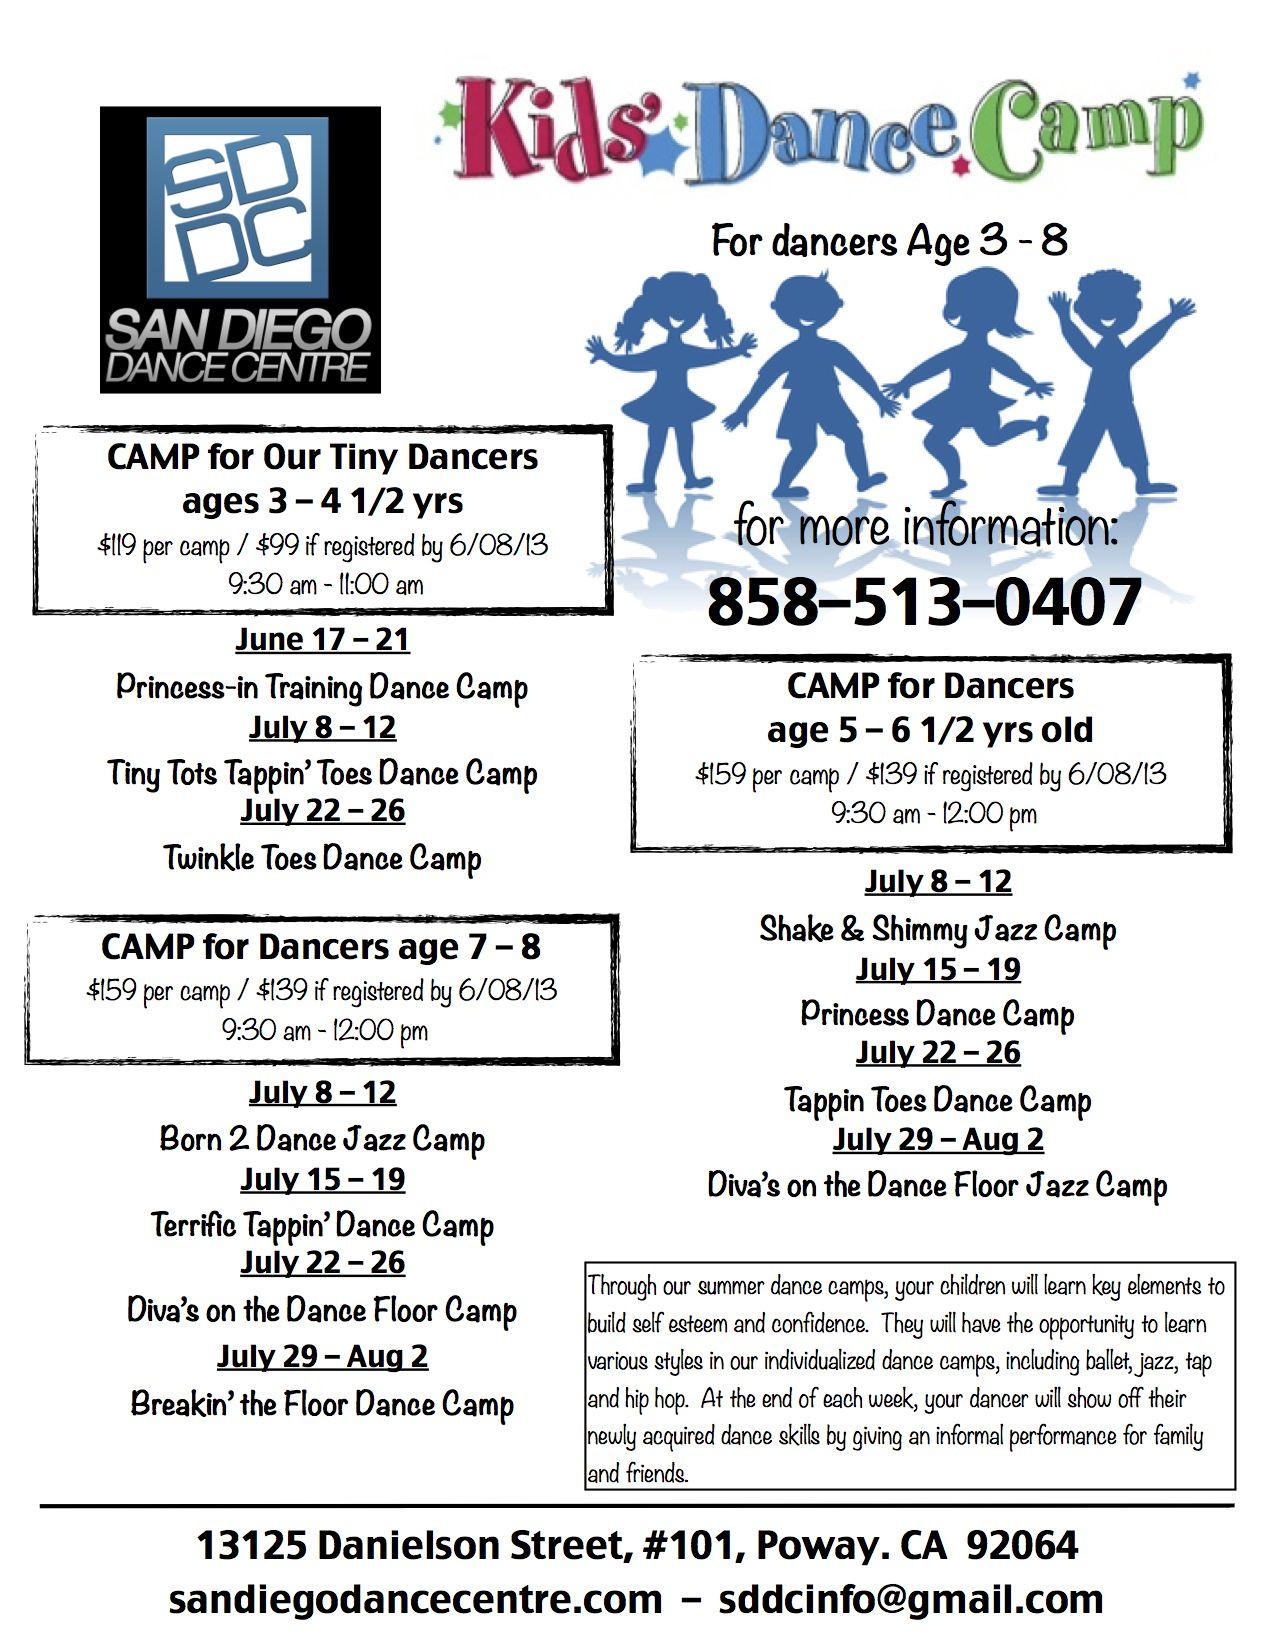 Summer Dance Camp Flyer 2013 San Diego Dance Centre #summer